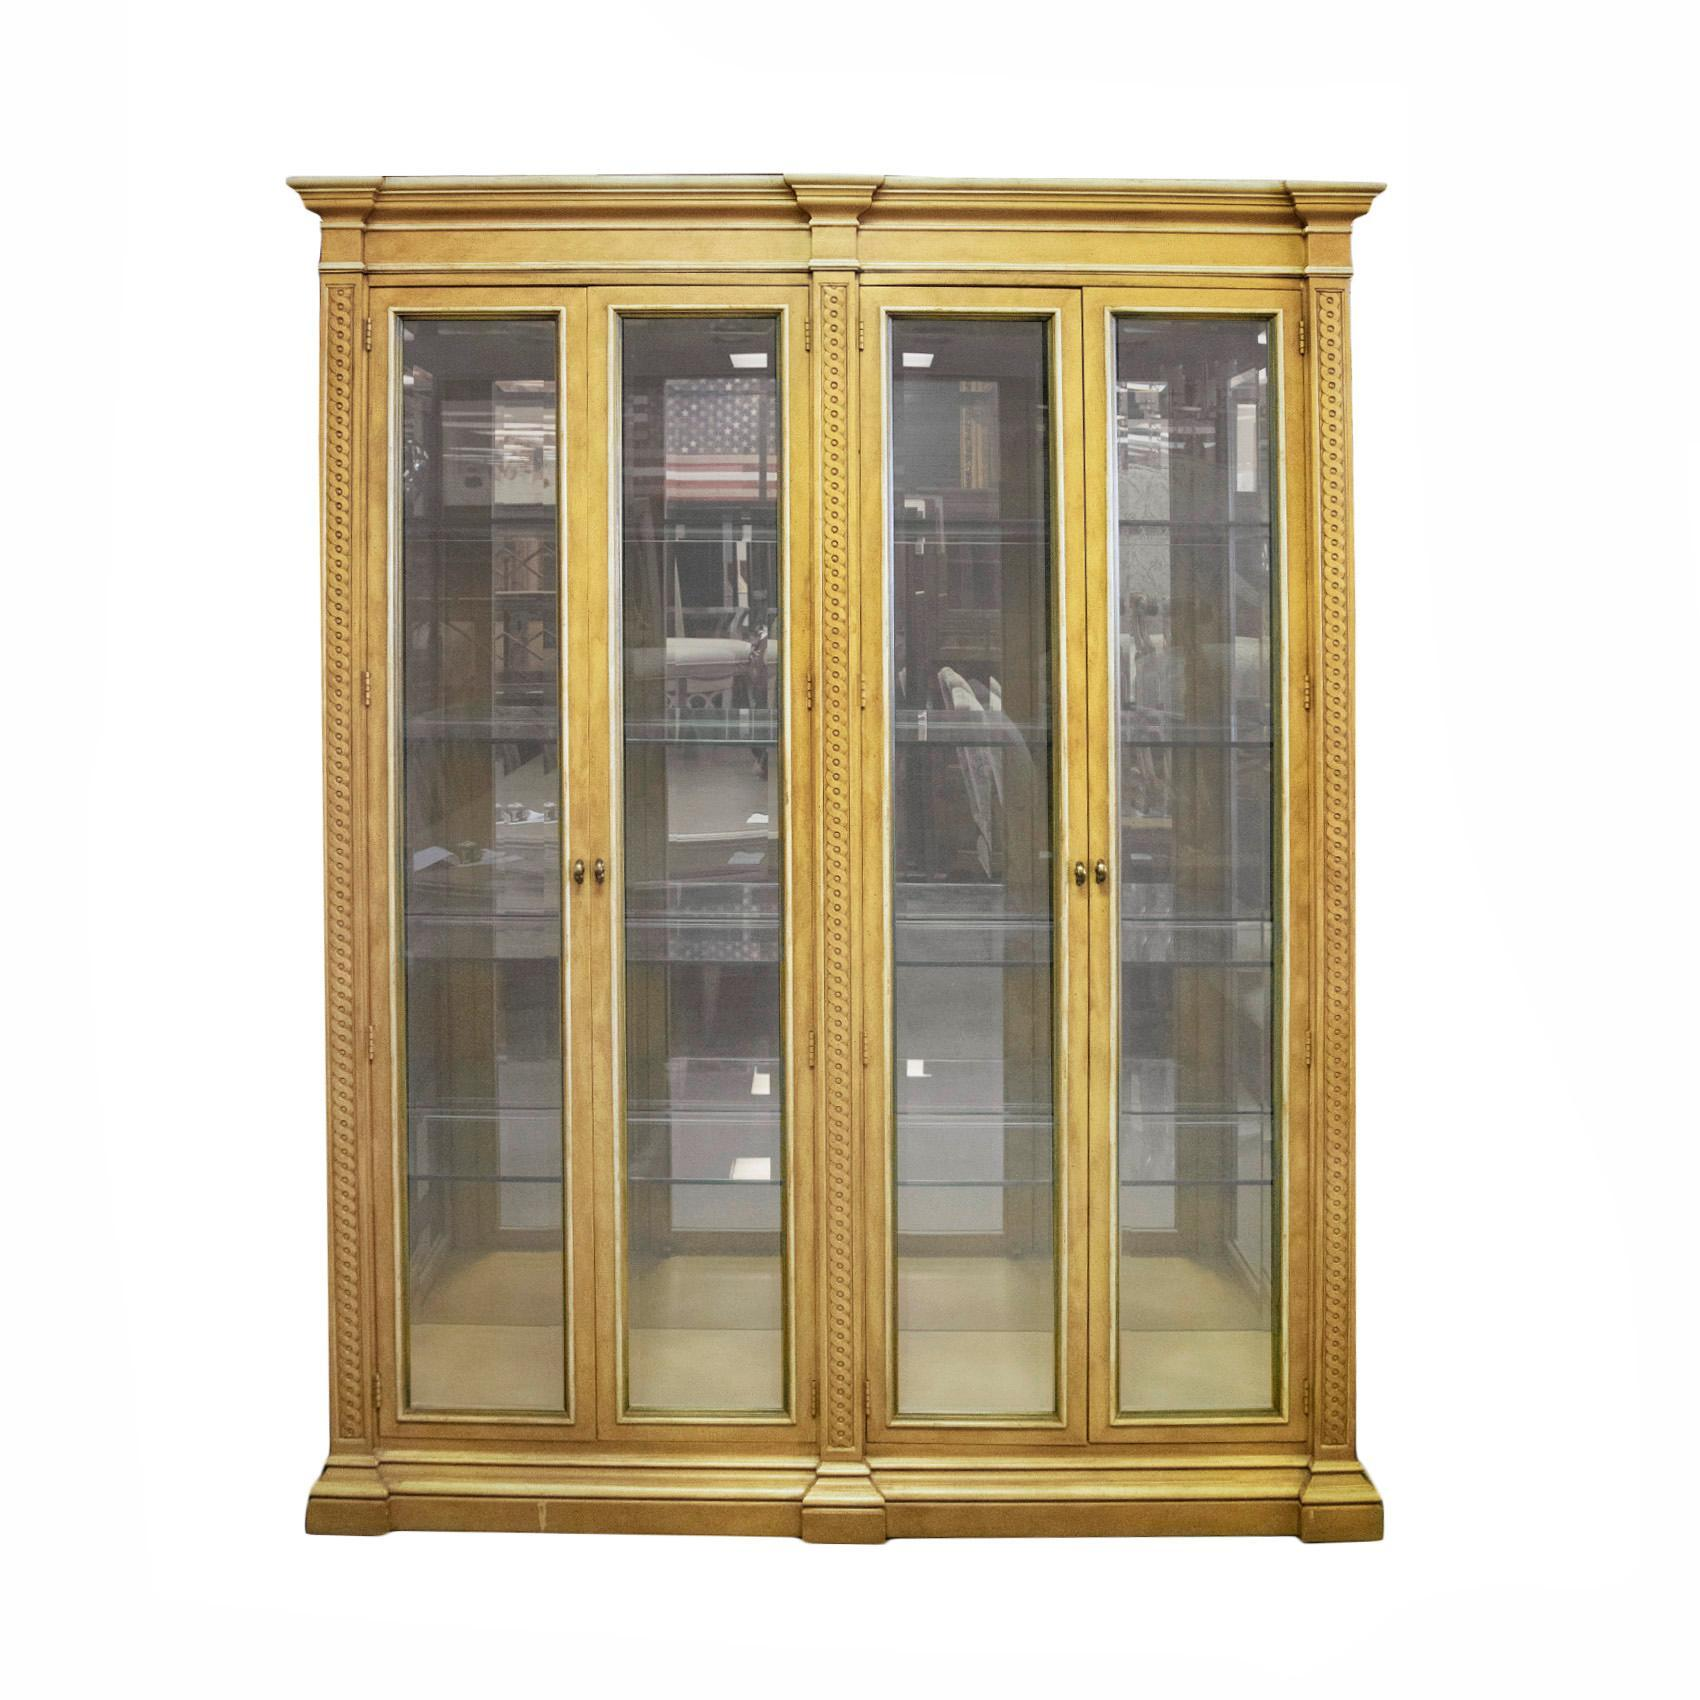 Henredon Double Sided Glass Cabinet